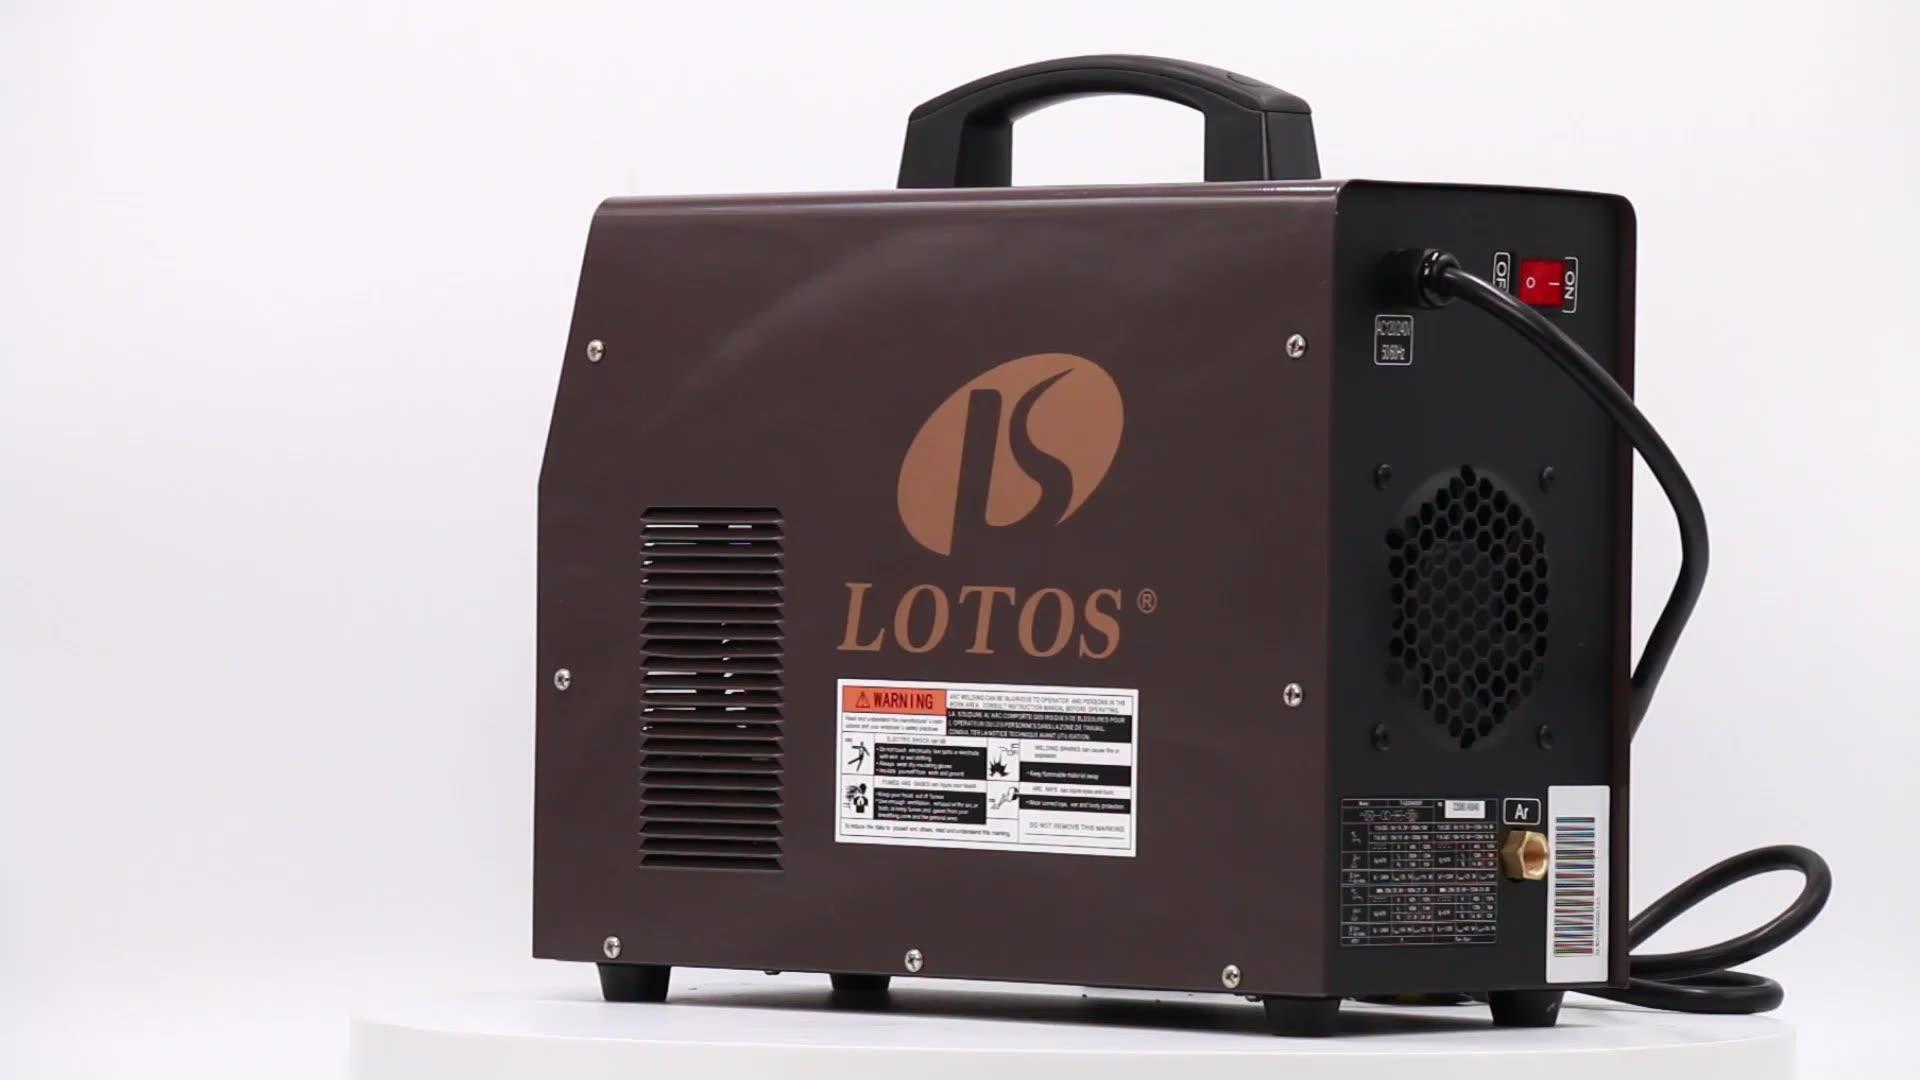 Lotos inverter ac dc saldatura tig inverter 200a 110v 220v in alluminio saldatore tig mma impulso macchina di saldatura tig ac dc